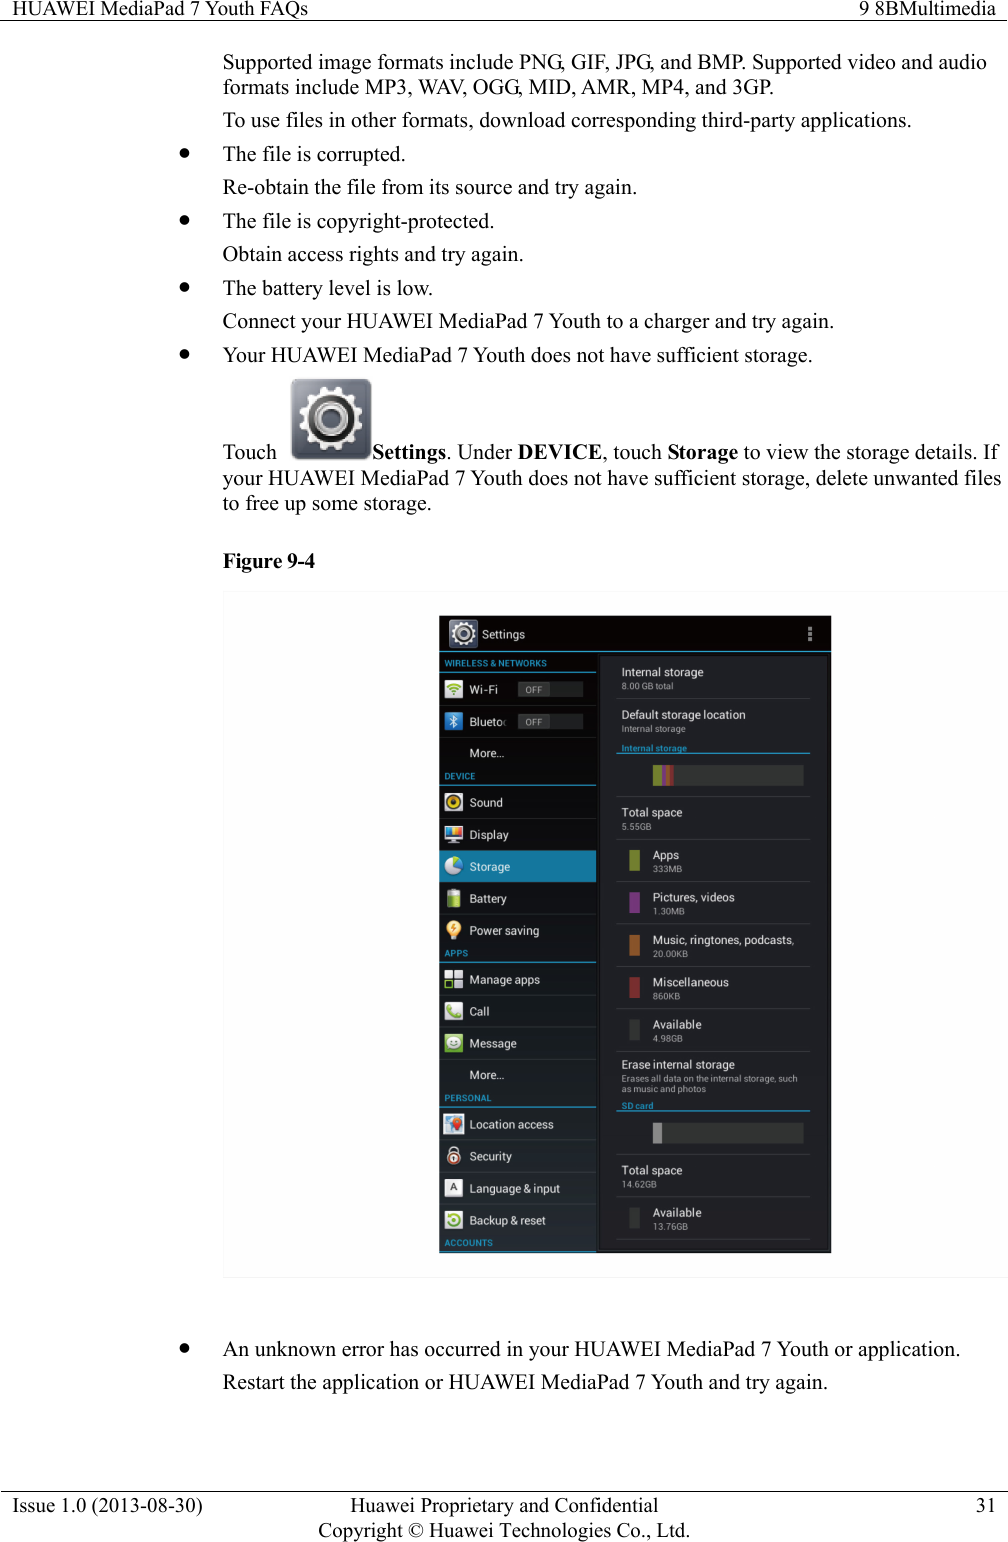 Huawei Media Pad 7 Youth FAQs(S7 701W, 01, EN)